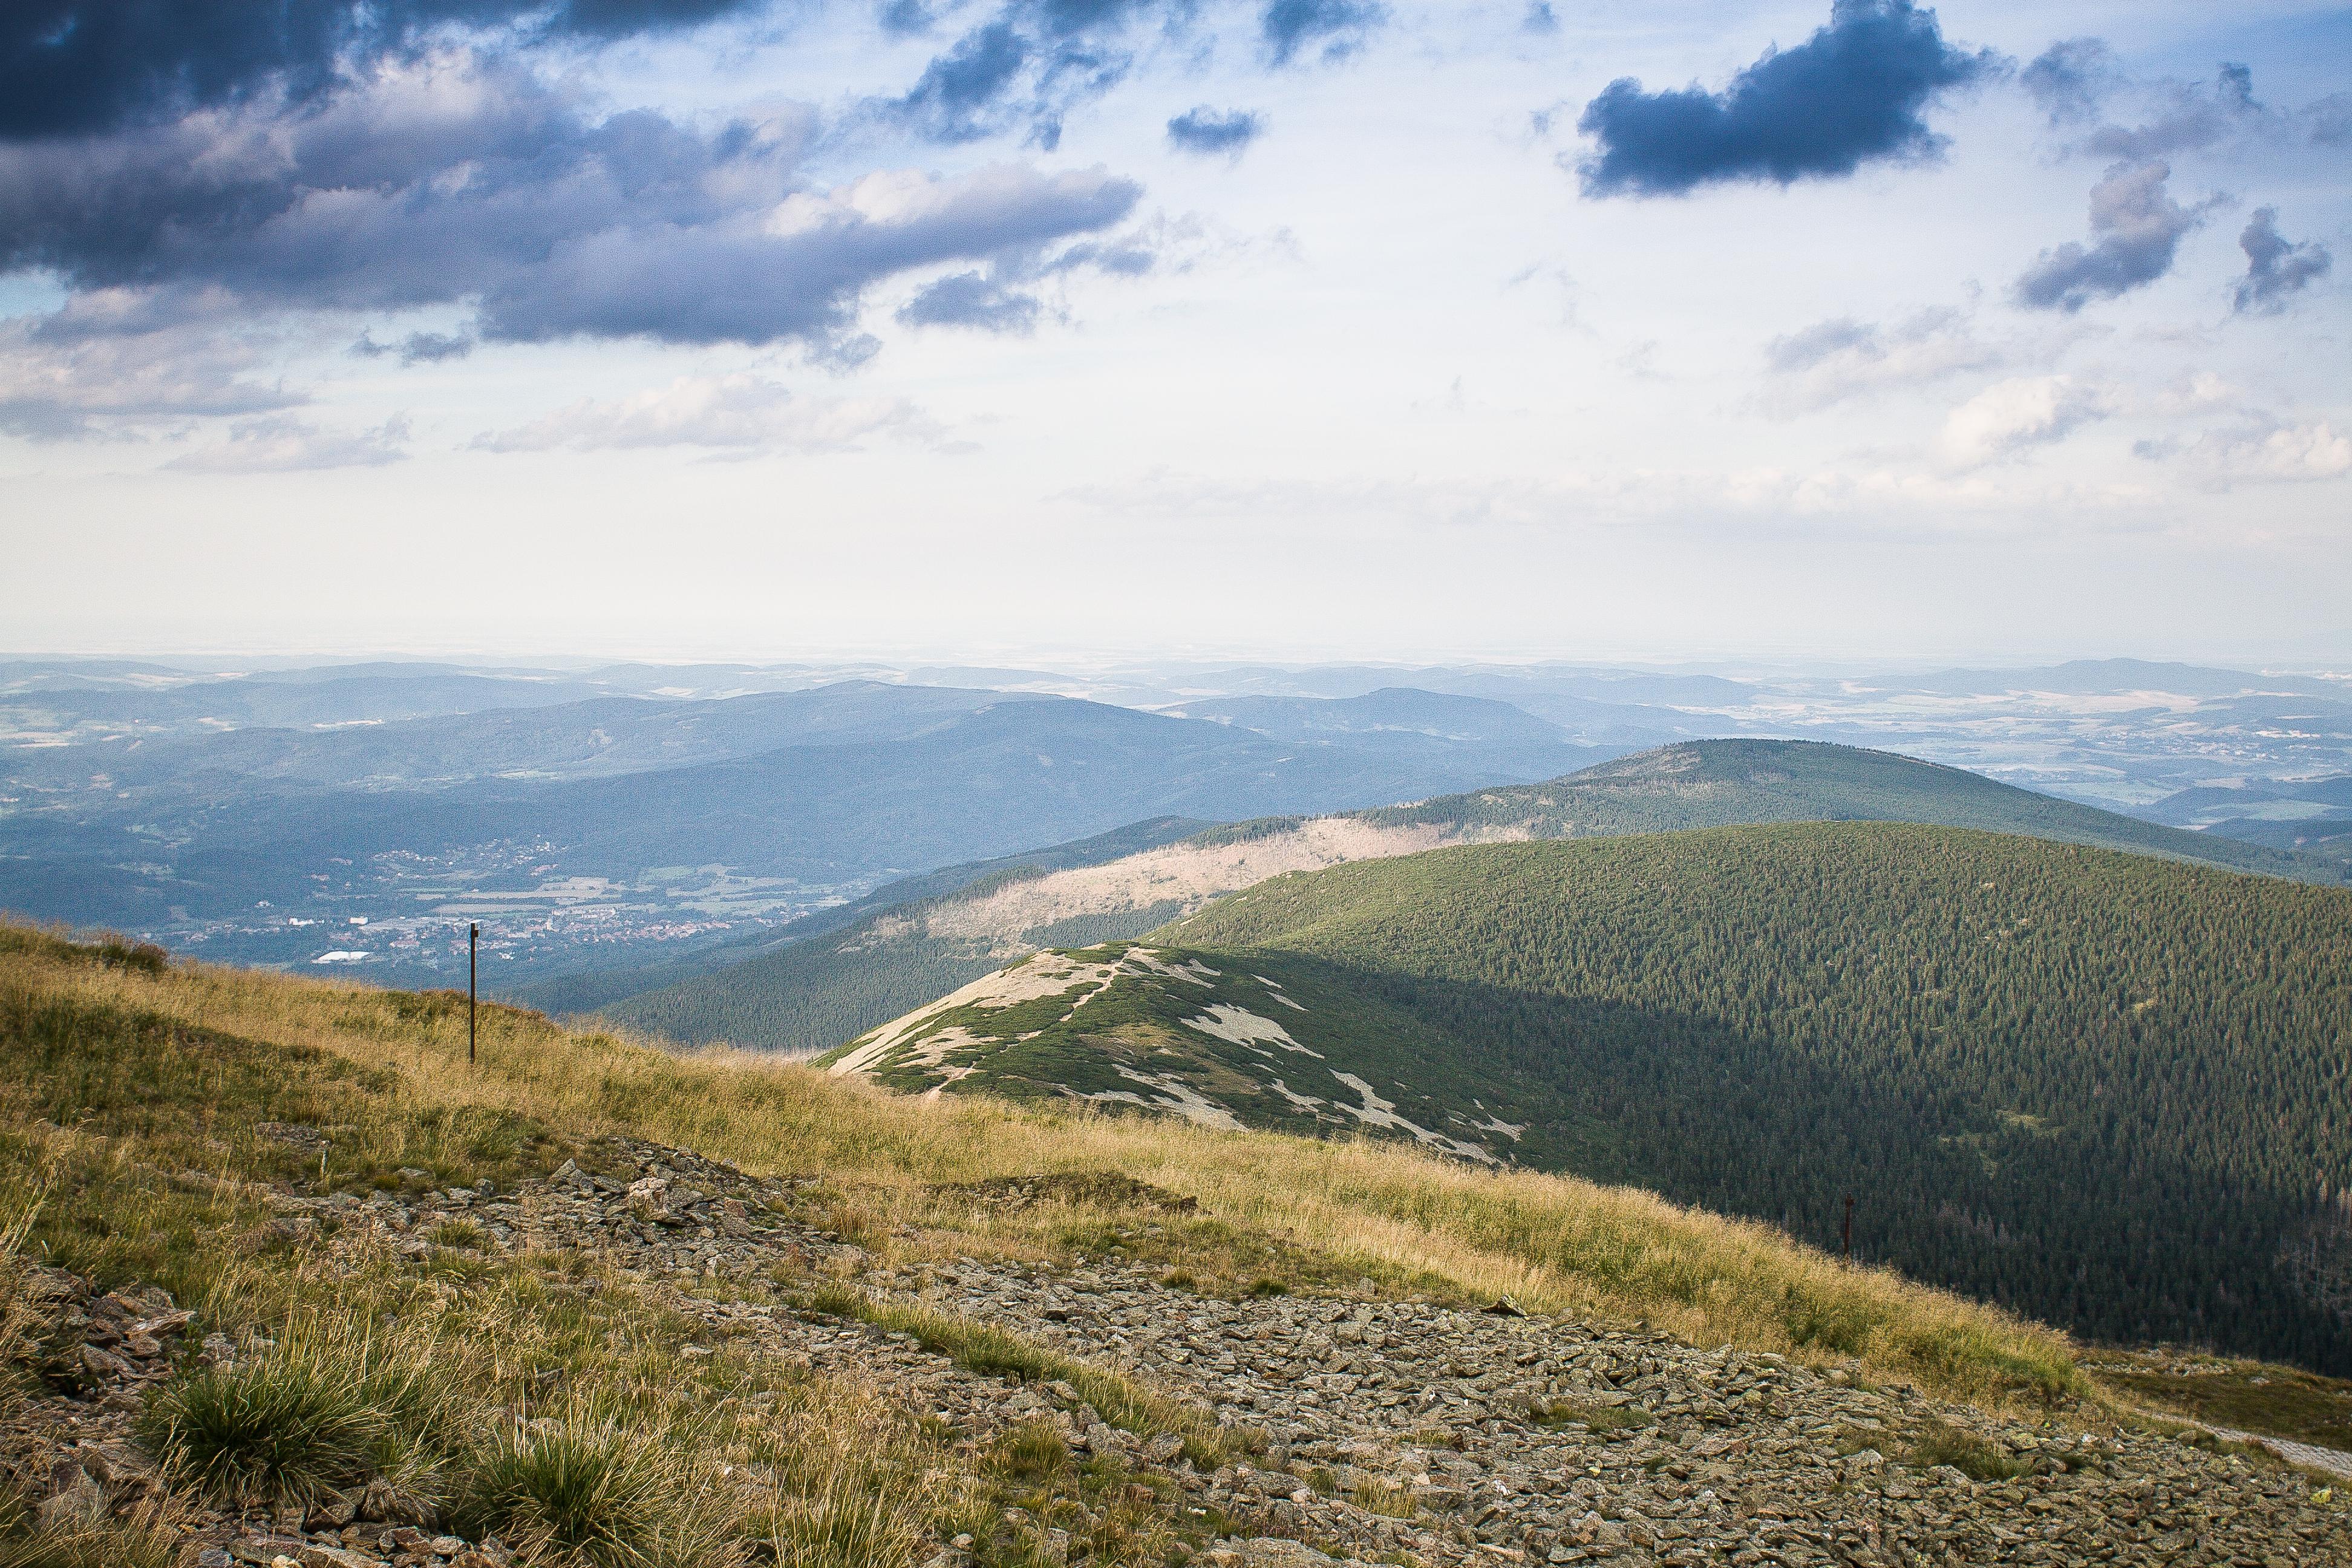 Download The Top of Sněžka Mountain, Czech Republic FREE Stock Photo